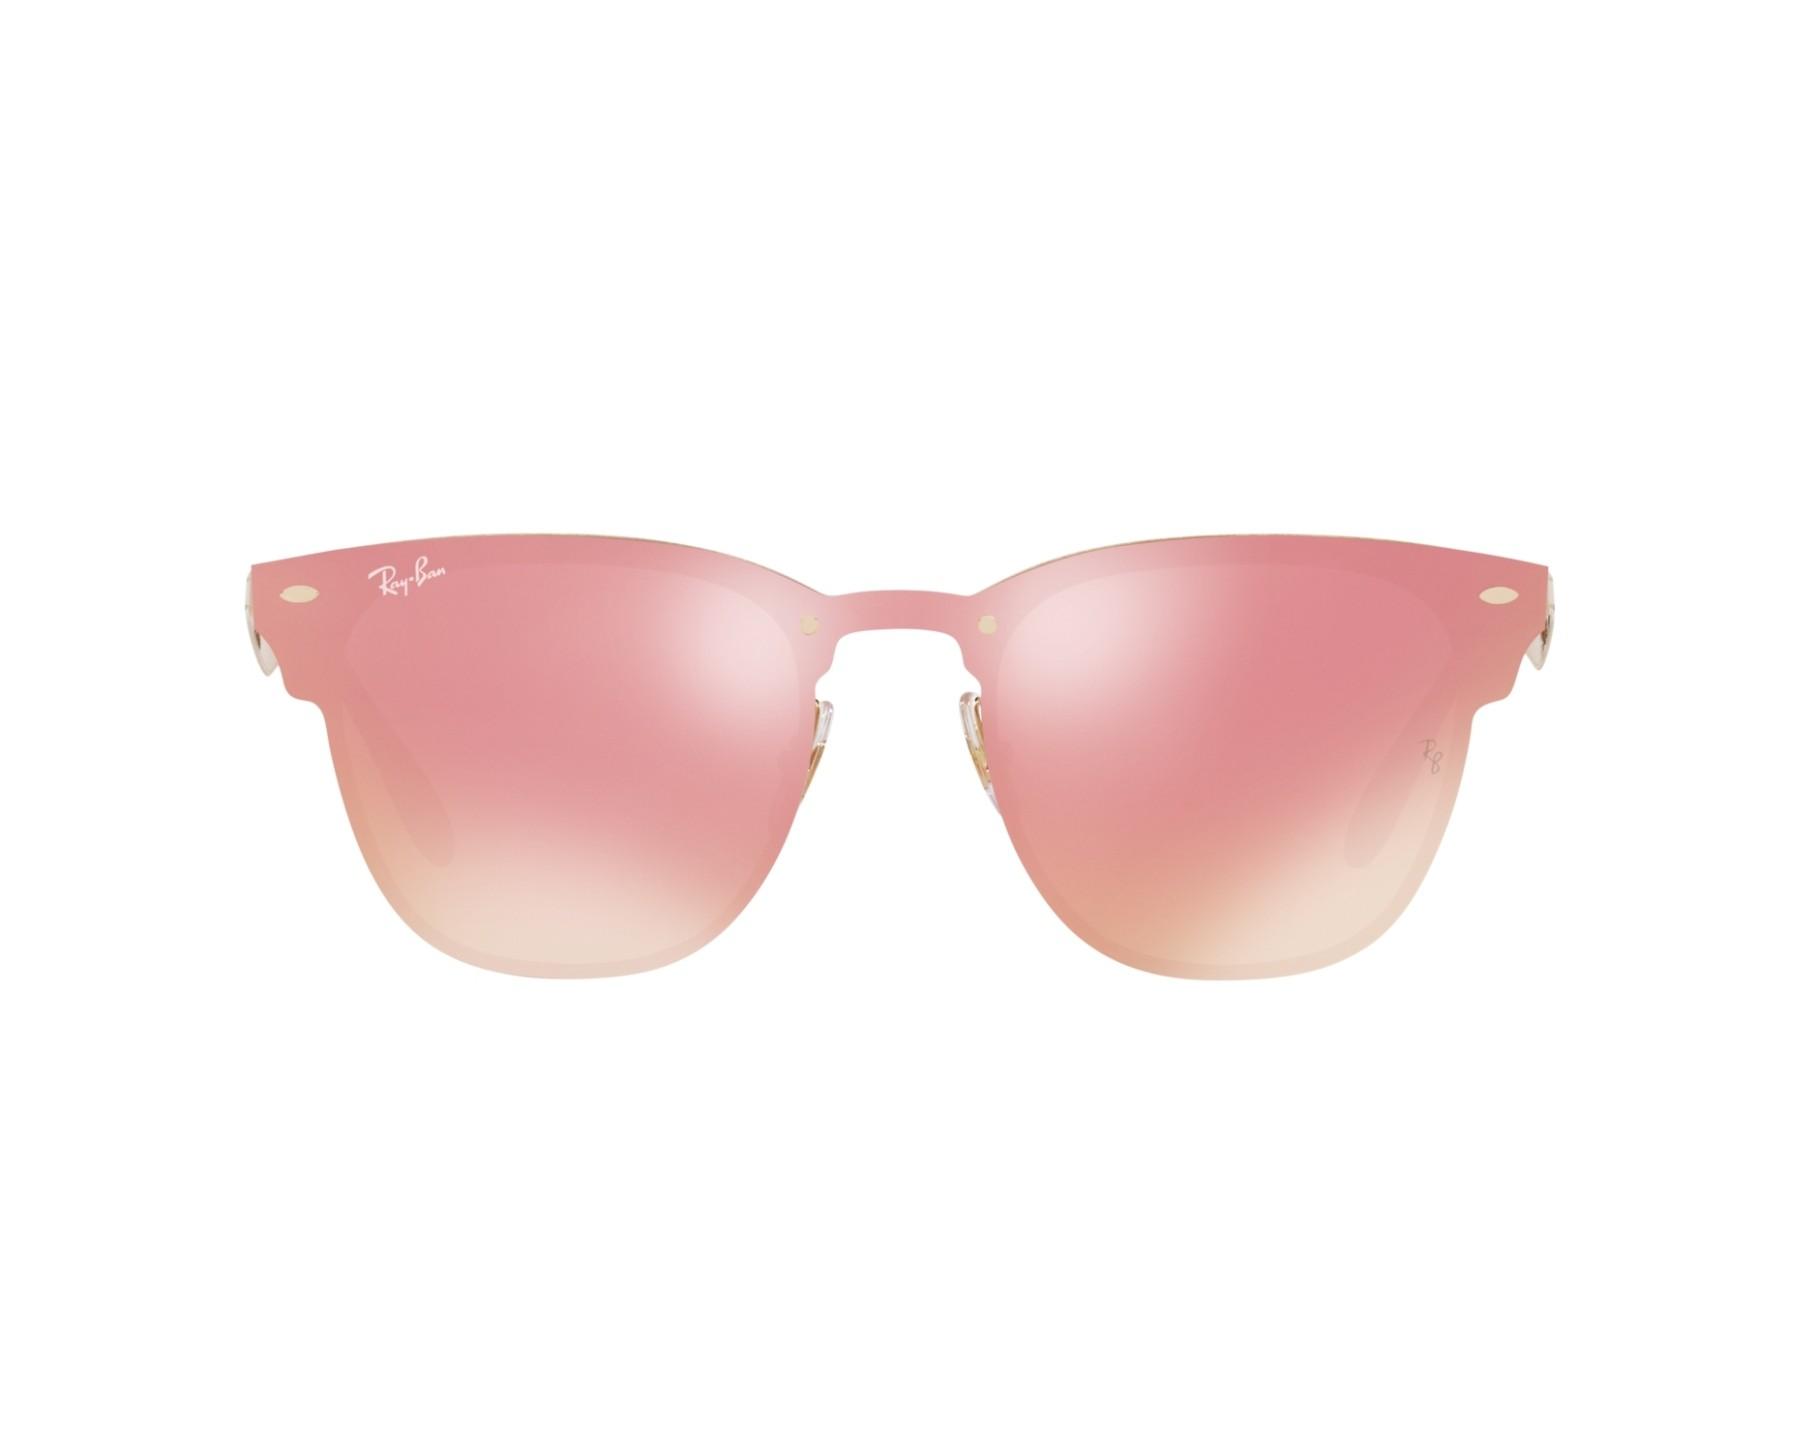 Sunglasses Ray-Ban RB-3576-N 043 E4 51- Gold 360 7c28dbac62